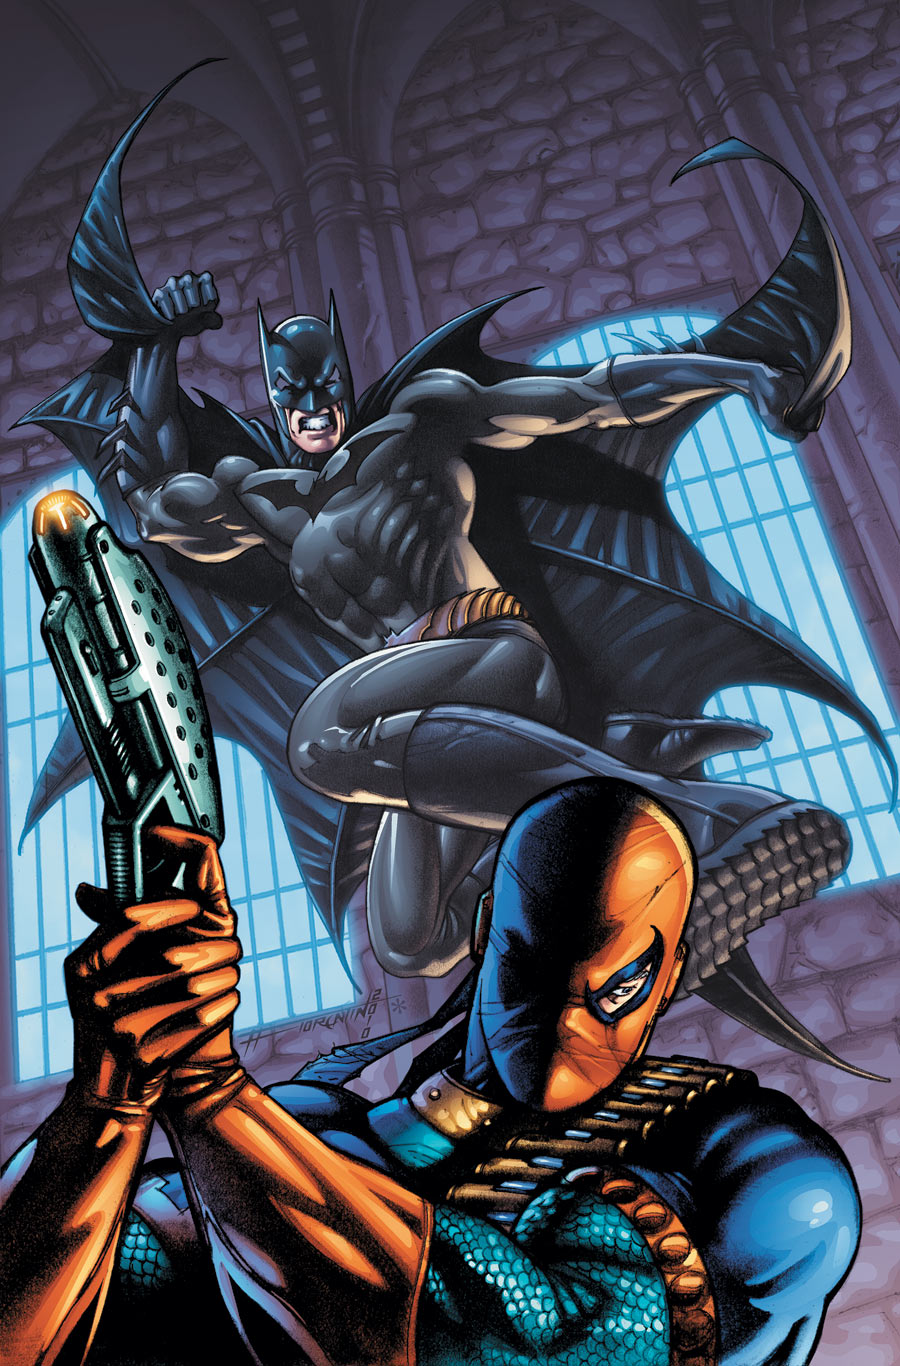 Joe Manganiello (Deathstroke) Says THE BATMAN Takes Franchise in a